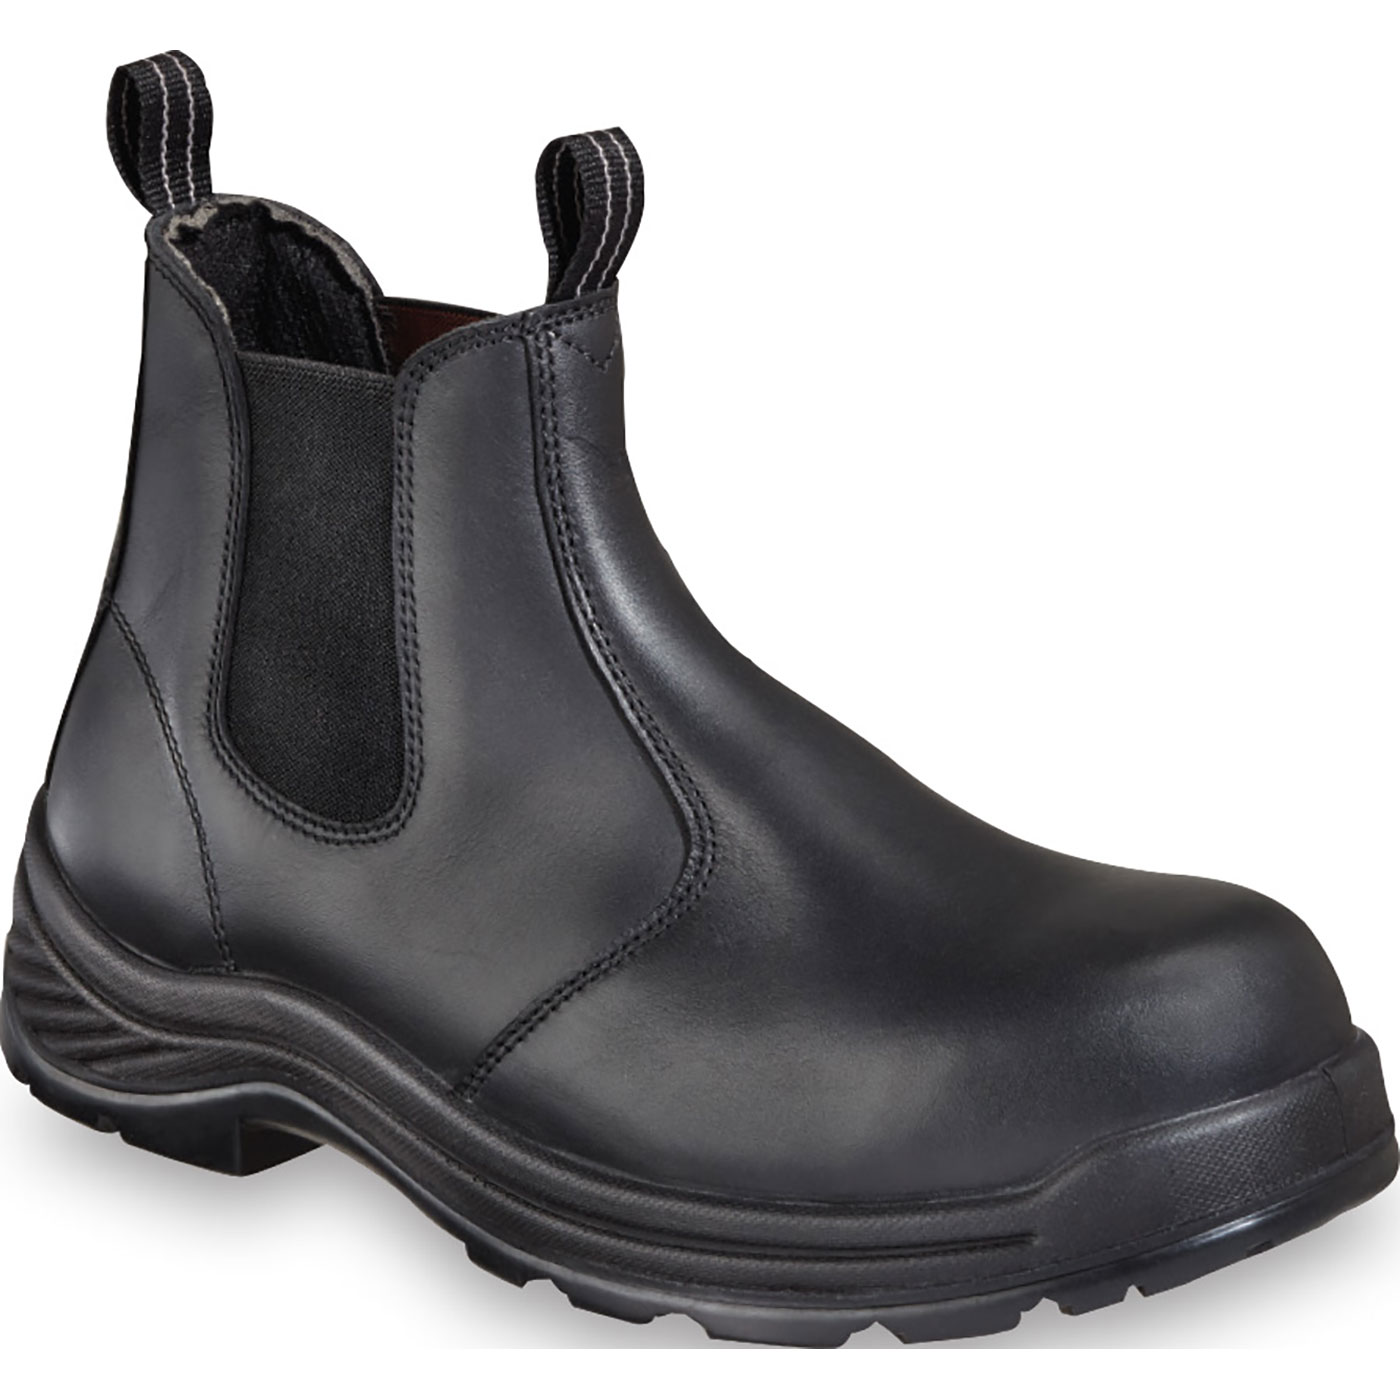 4752310729a Thorogood Quick-Release Men's 6 inch Composite Toe Non-Metallic Slip-On  Work Shoe